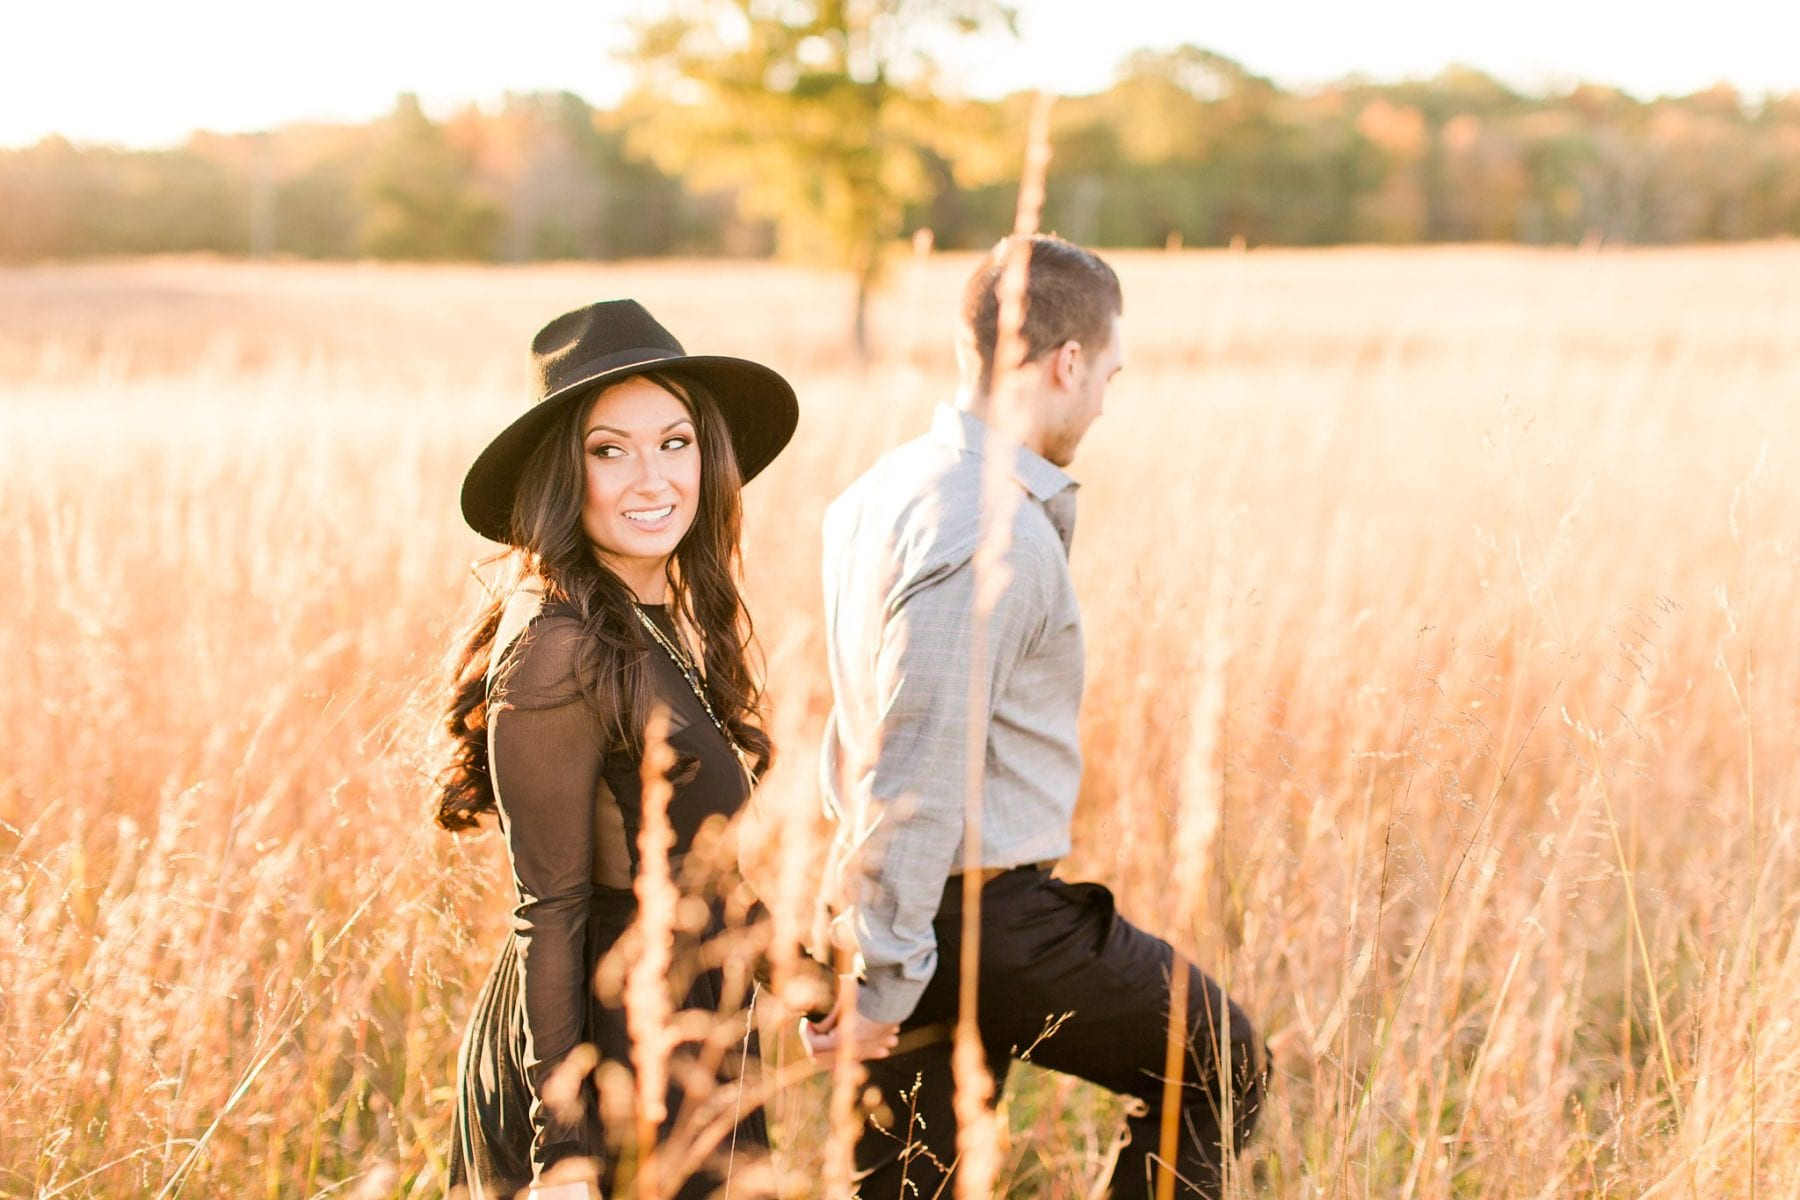 Manassas Battlefield Portraits Virginia Wedding Photographer Megan Kelsey Photography Lianne & Chris-201.jpg